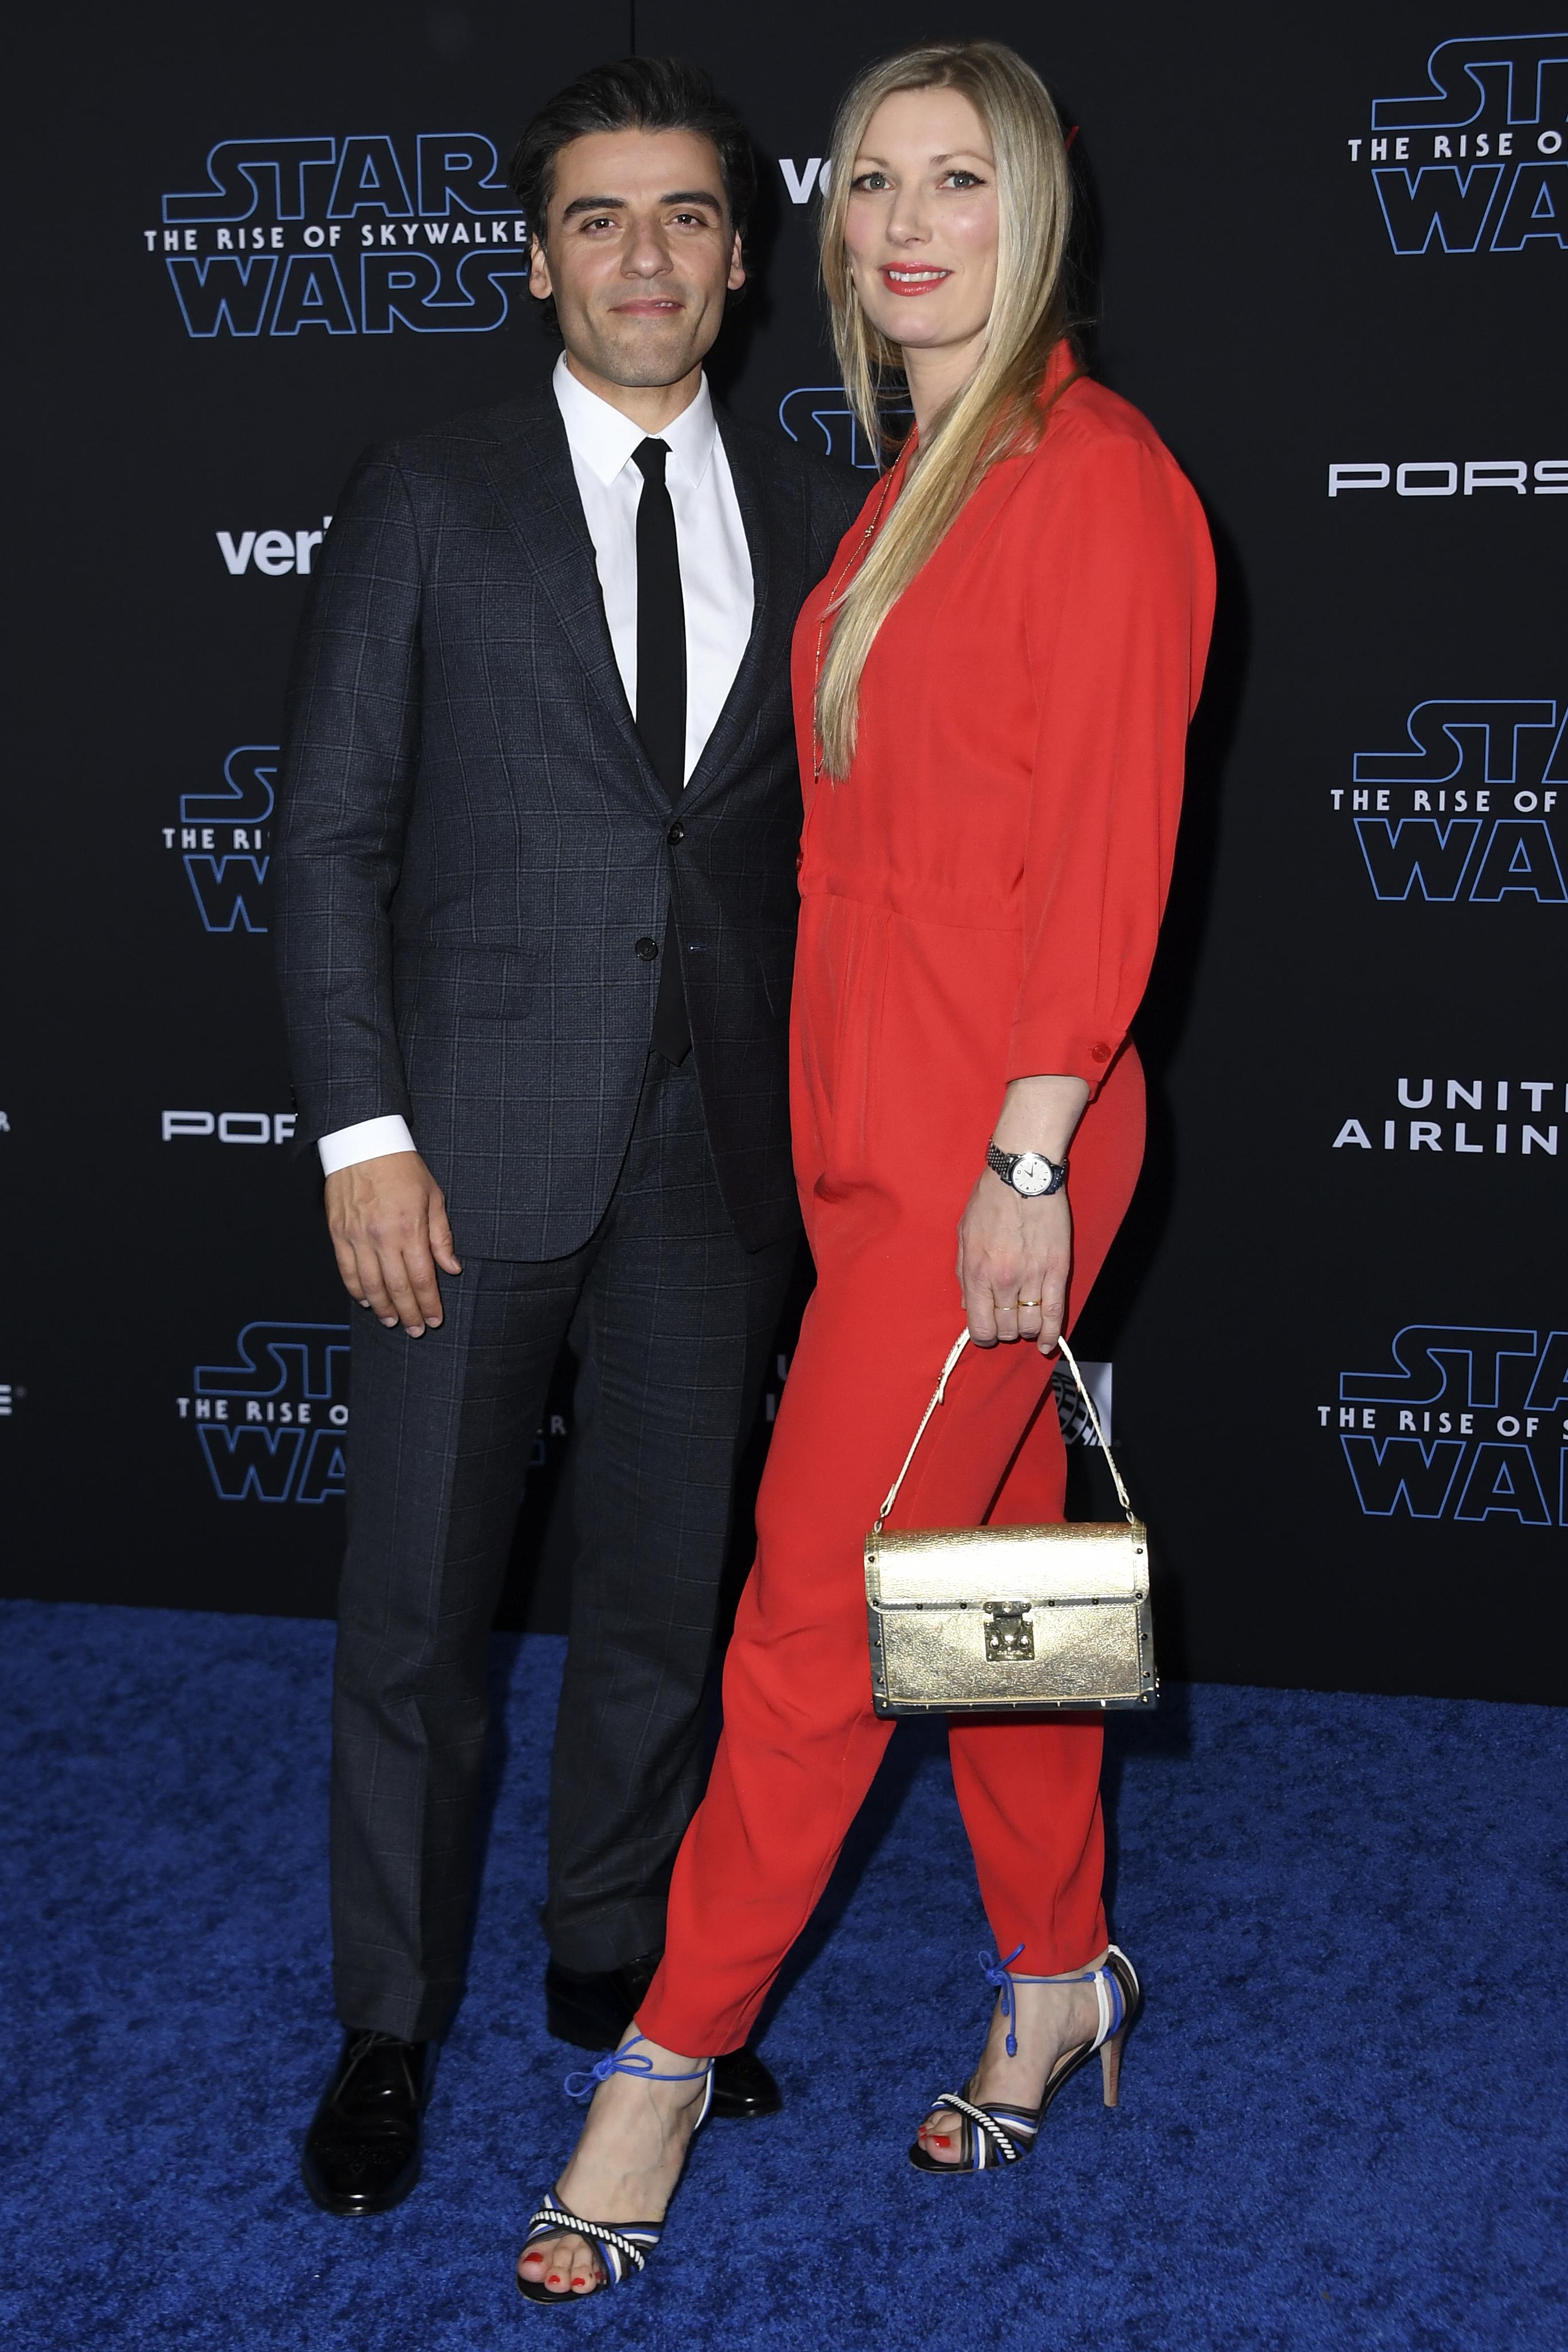 star wars the rise of skywalker, looks, premiere